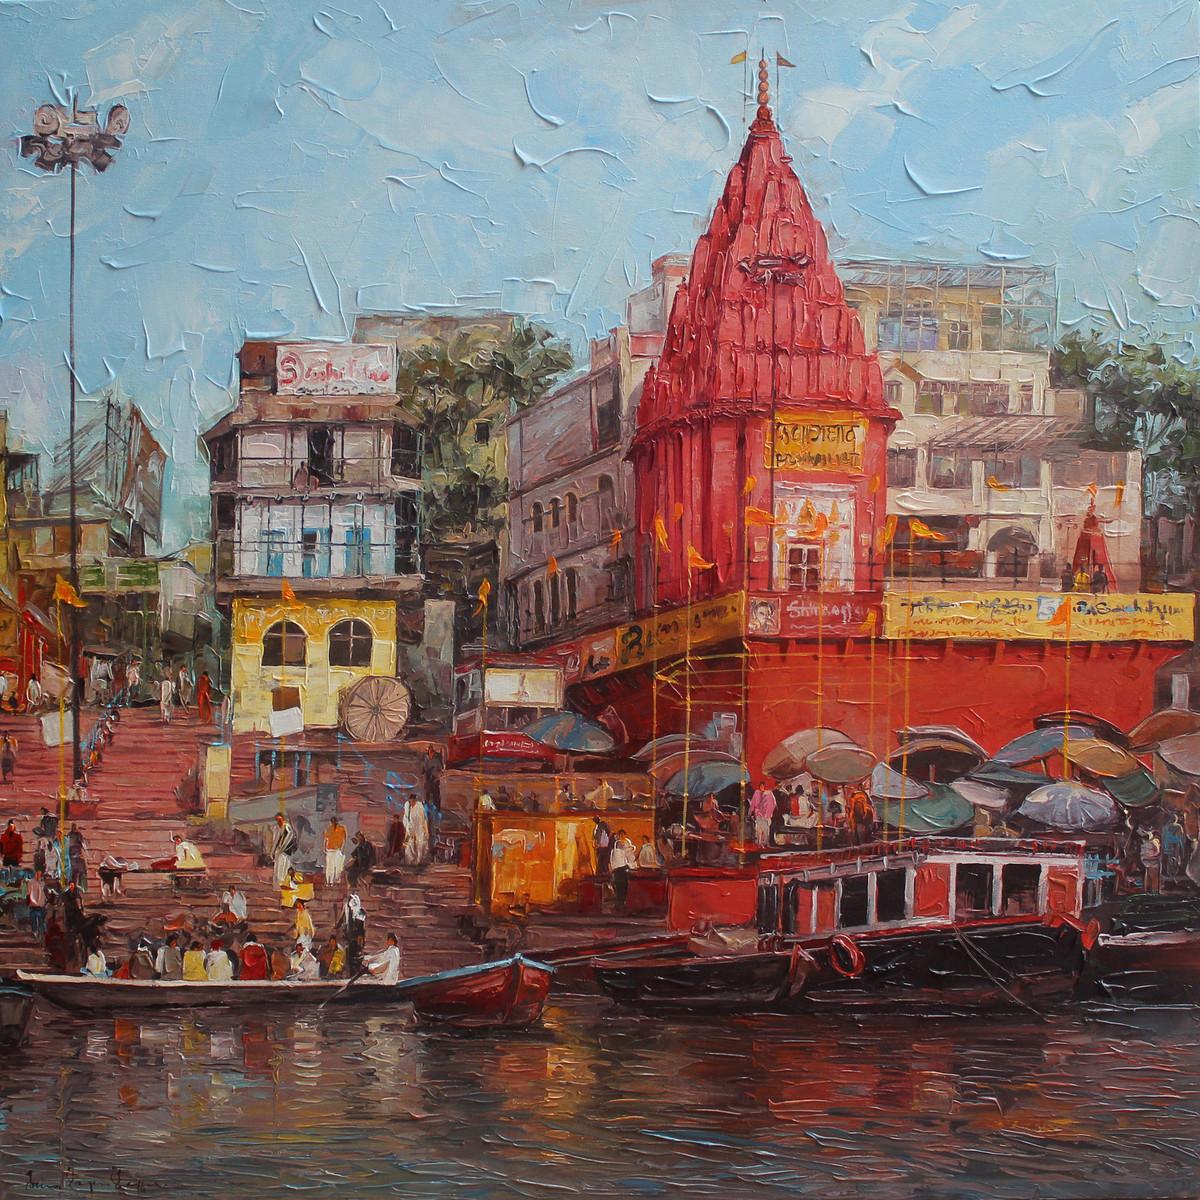 Varanasi_02 by Iruvan Karunakaran, Expressionism Painting, Acrylic on Canvas, Brown color